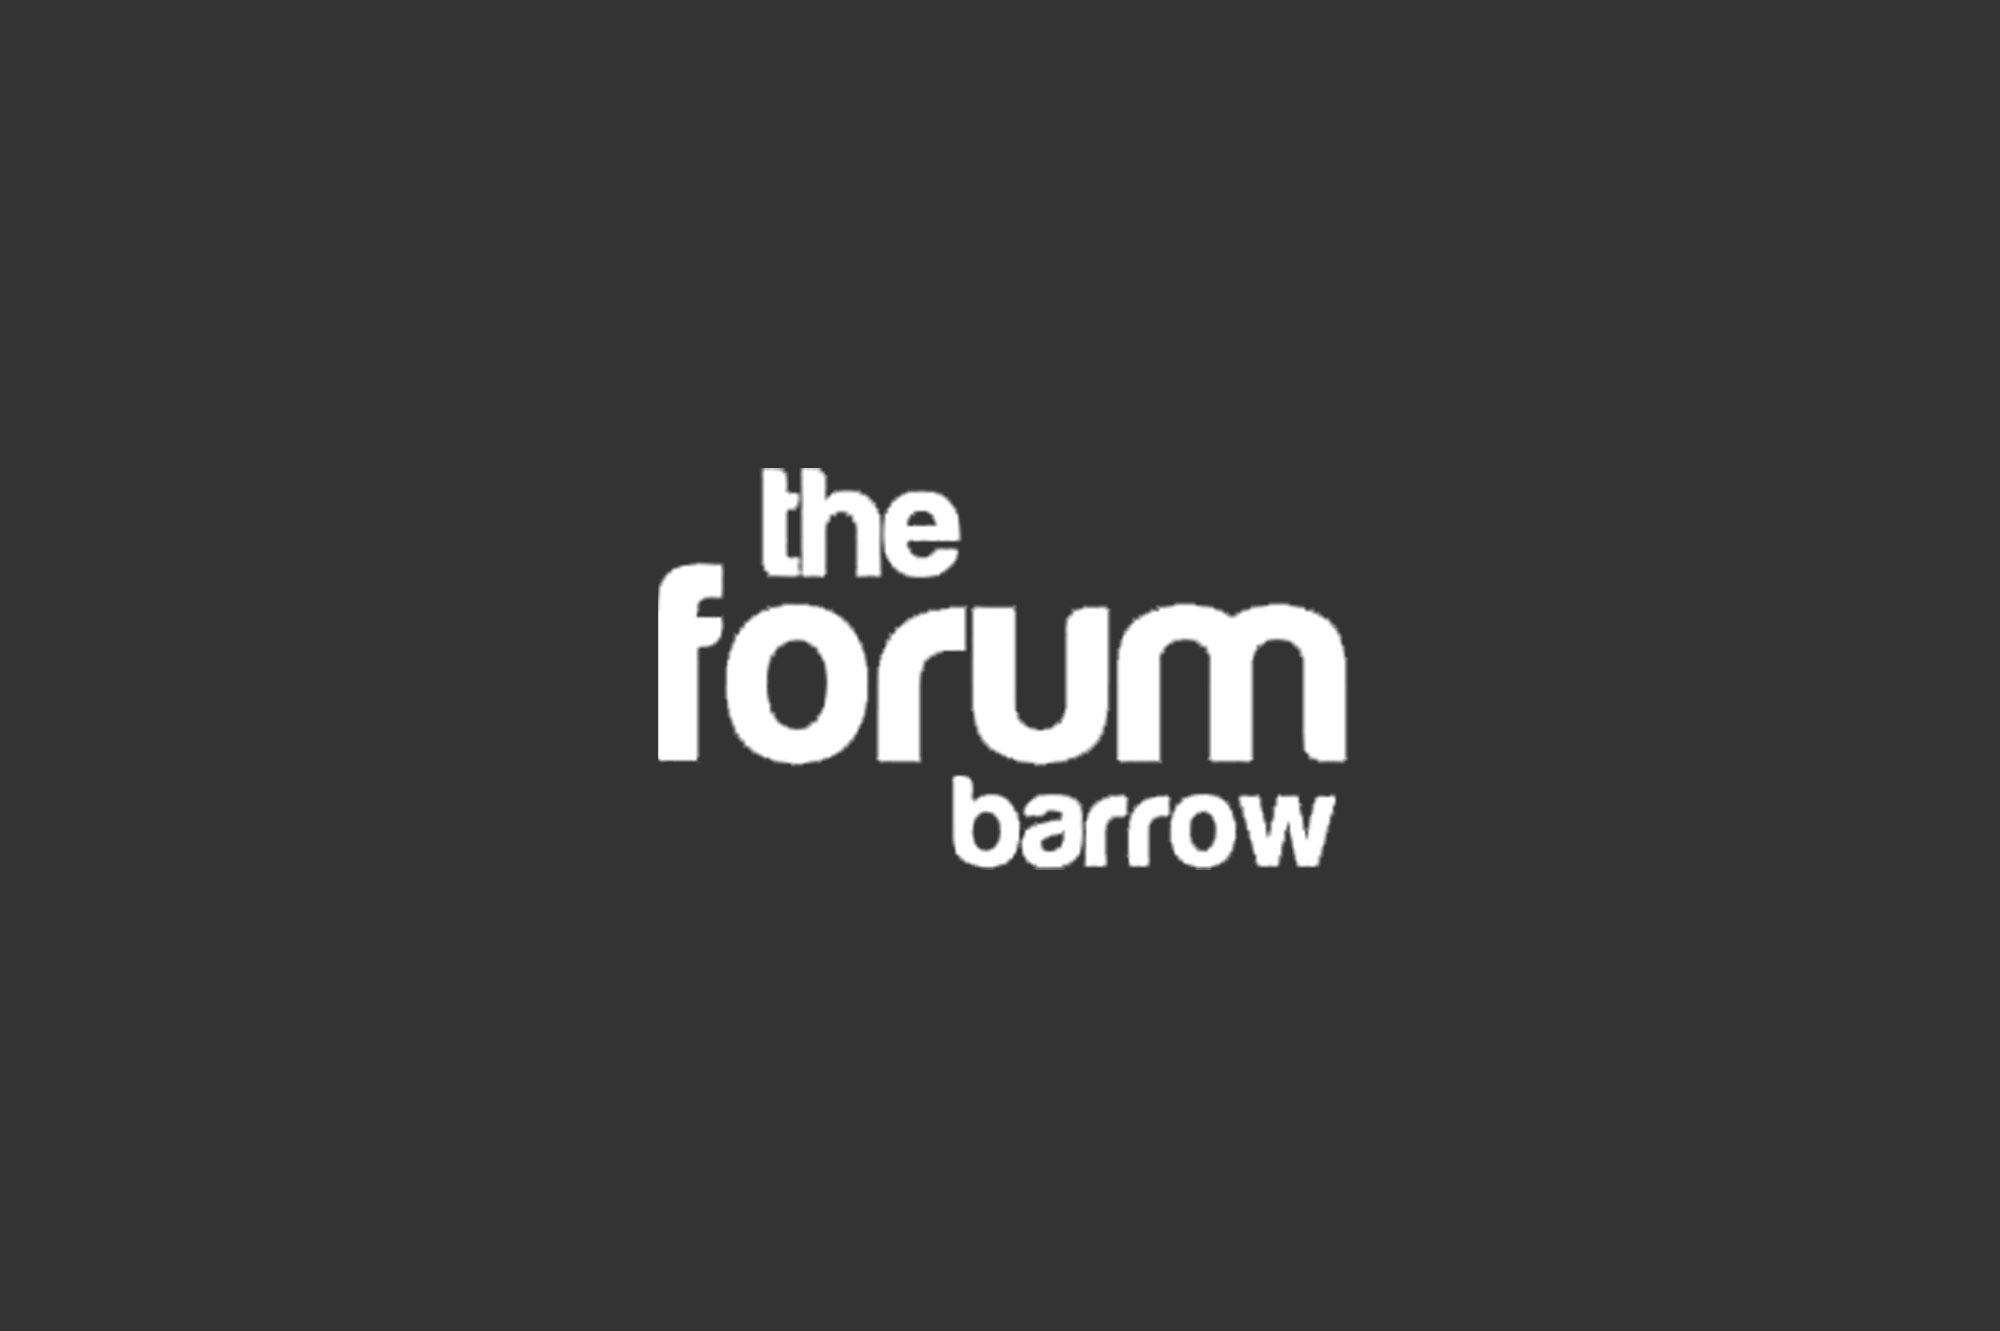 The Forum Barrow logo